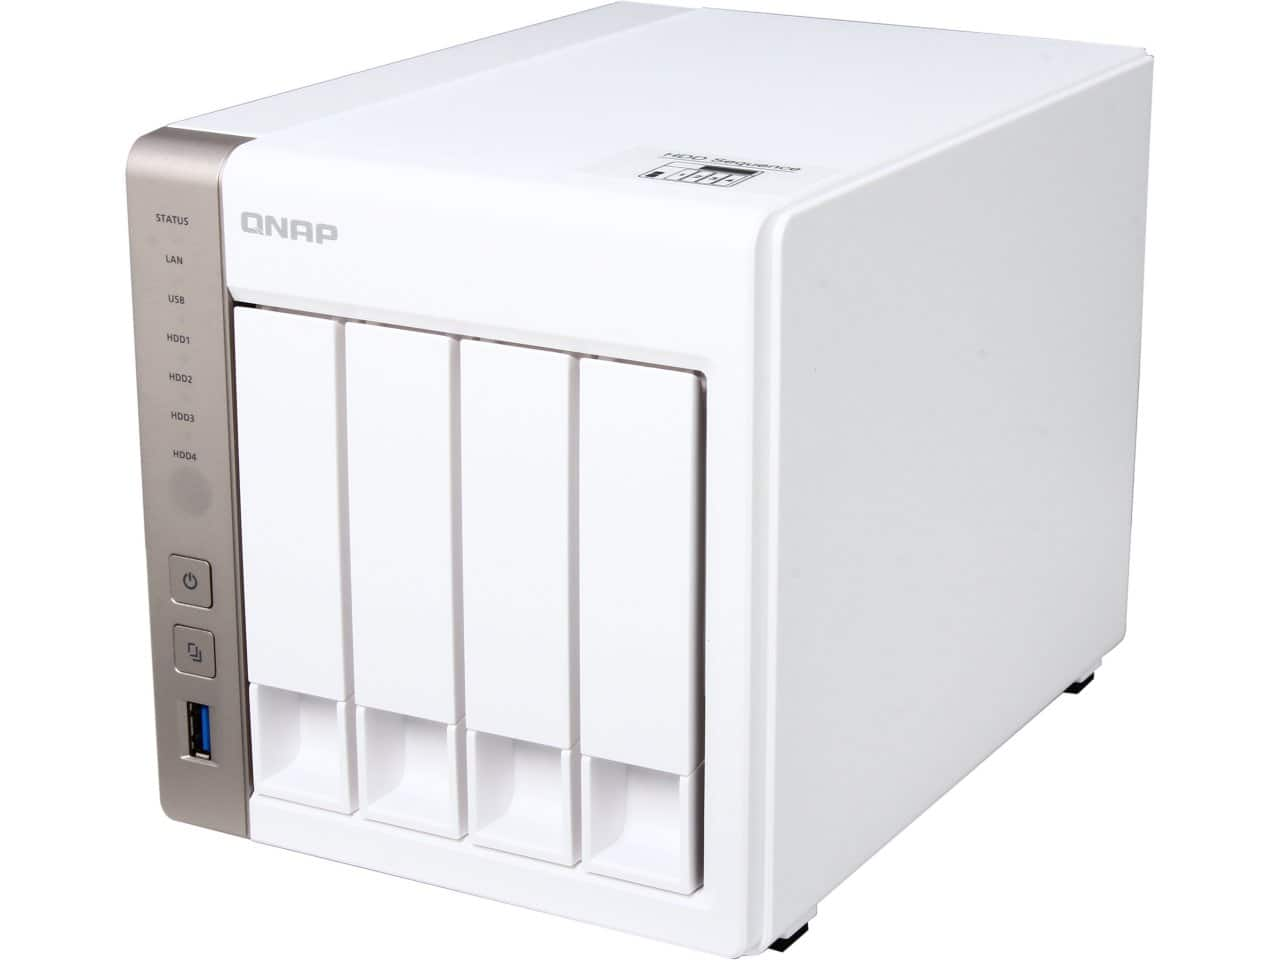 QNAP TS-451 Network Attached Storage $349.99 FS NeweggFlash